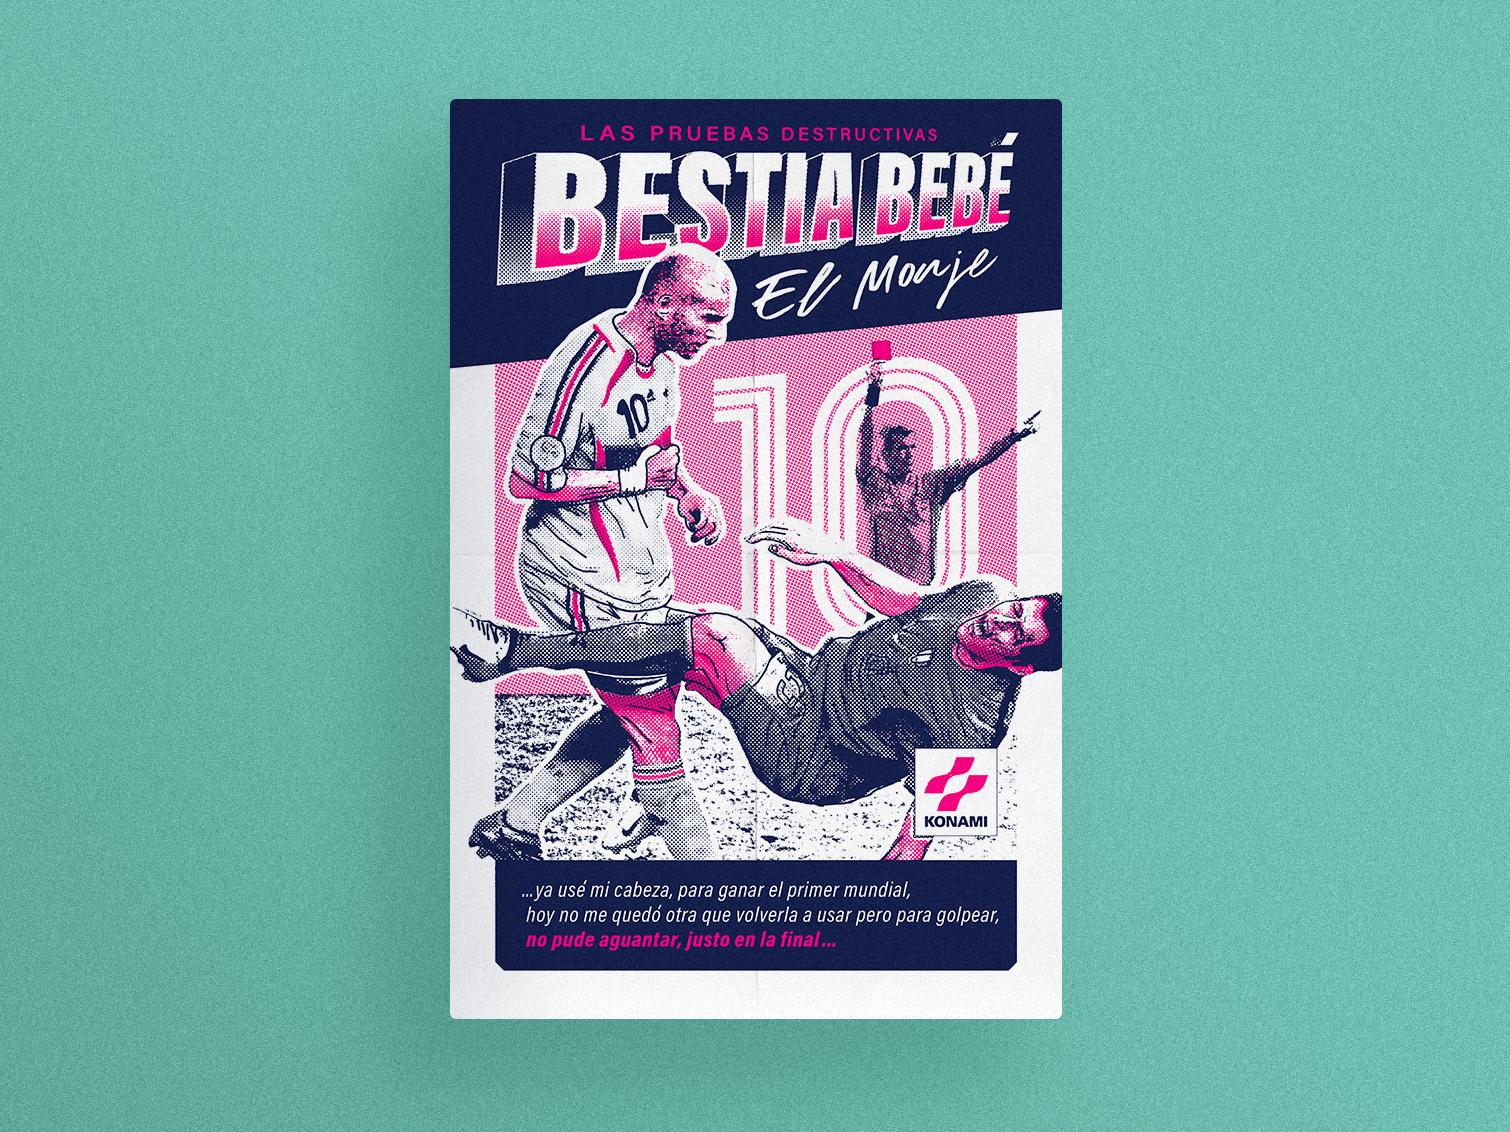 Bestia Bebé — El Monje first shot world cup france bestia bebe zidane poster print silkscreen